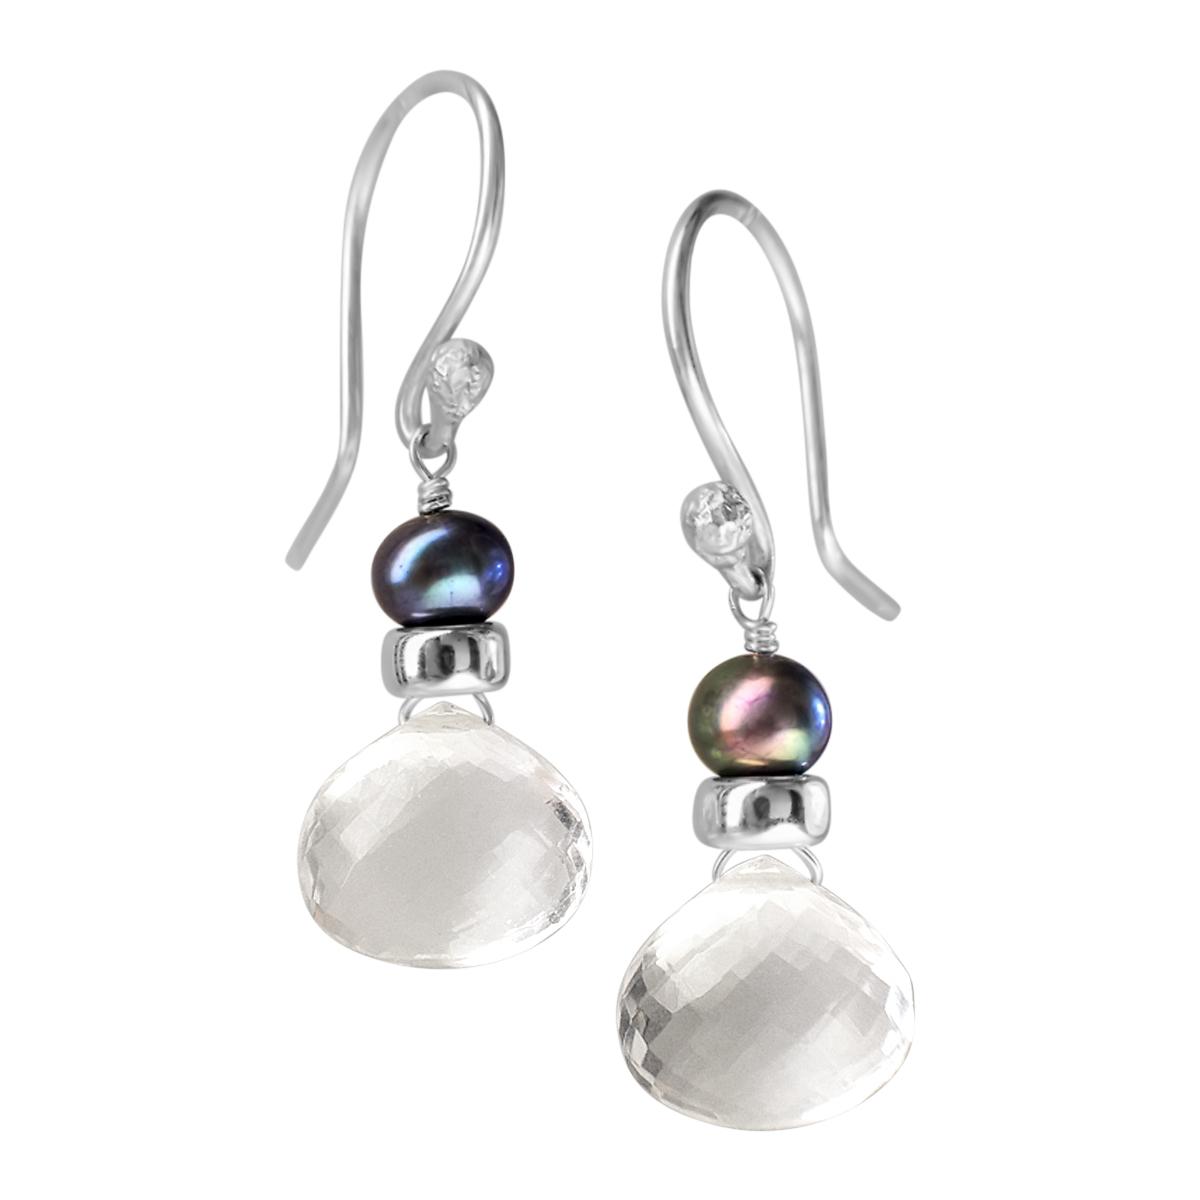 Perfume Bottle crystal quartz blue pearl earrings